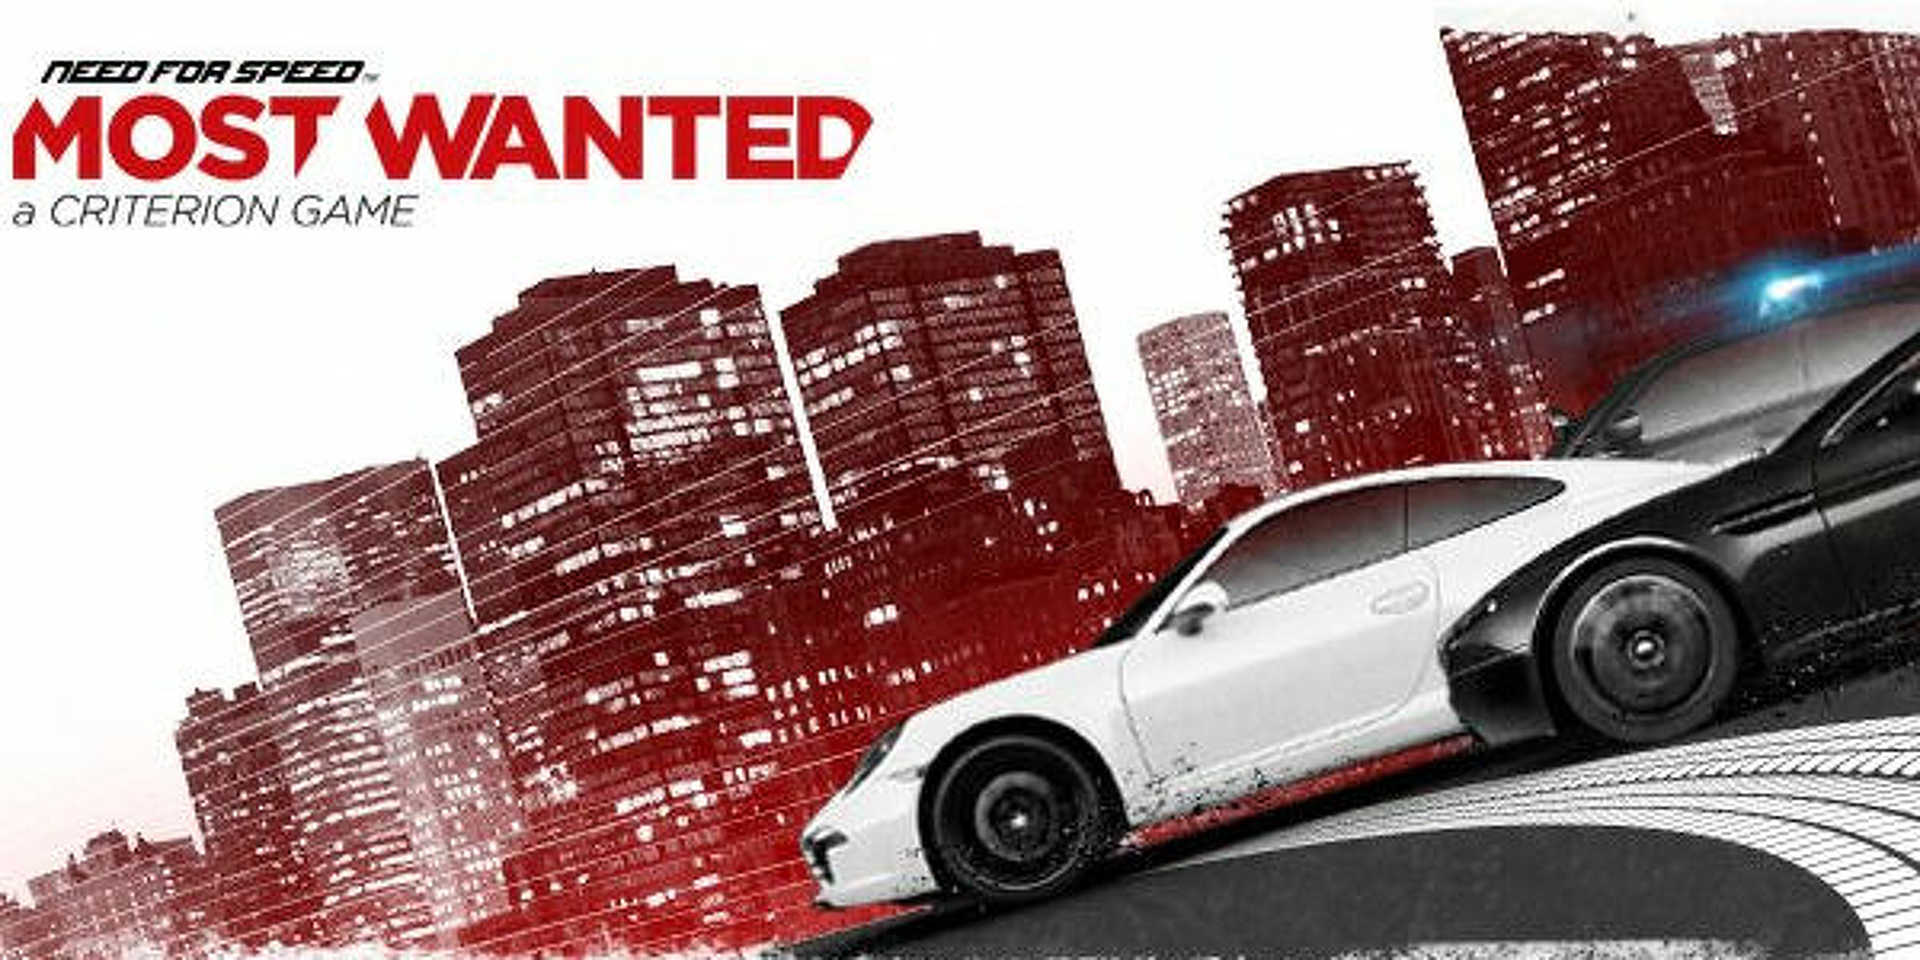 Ingyenes a Need for Speed